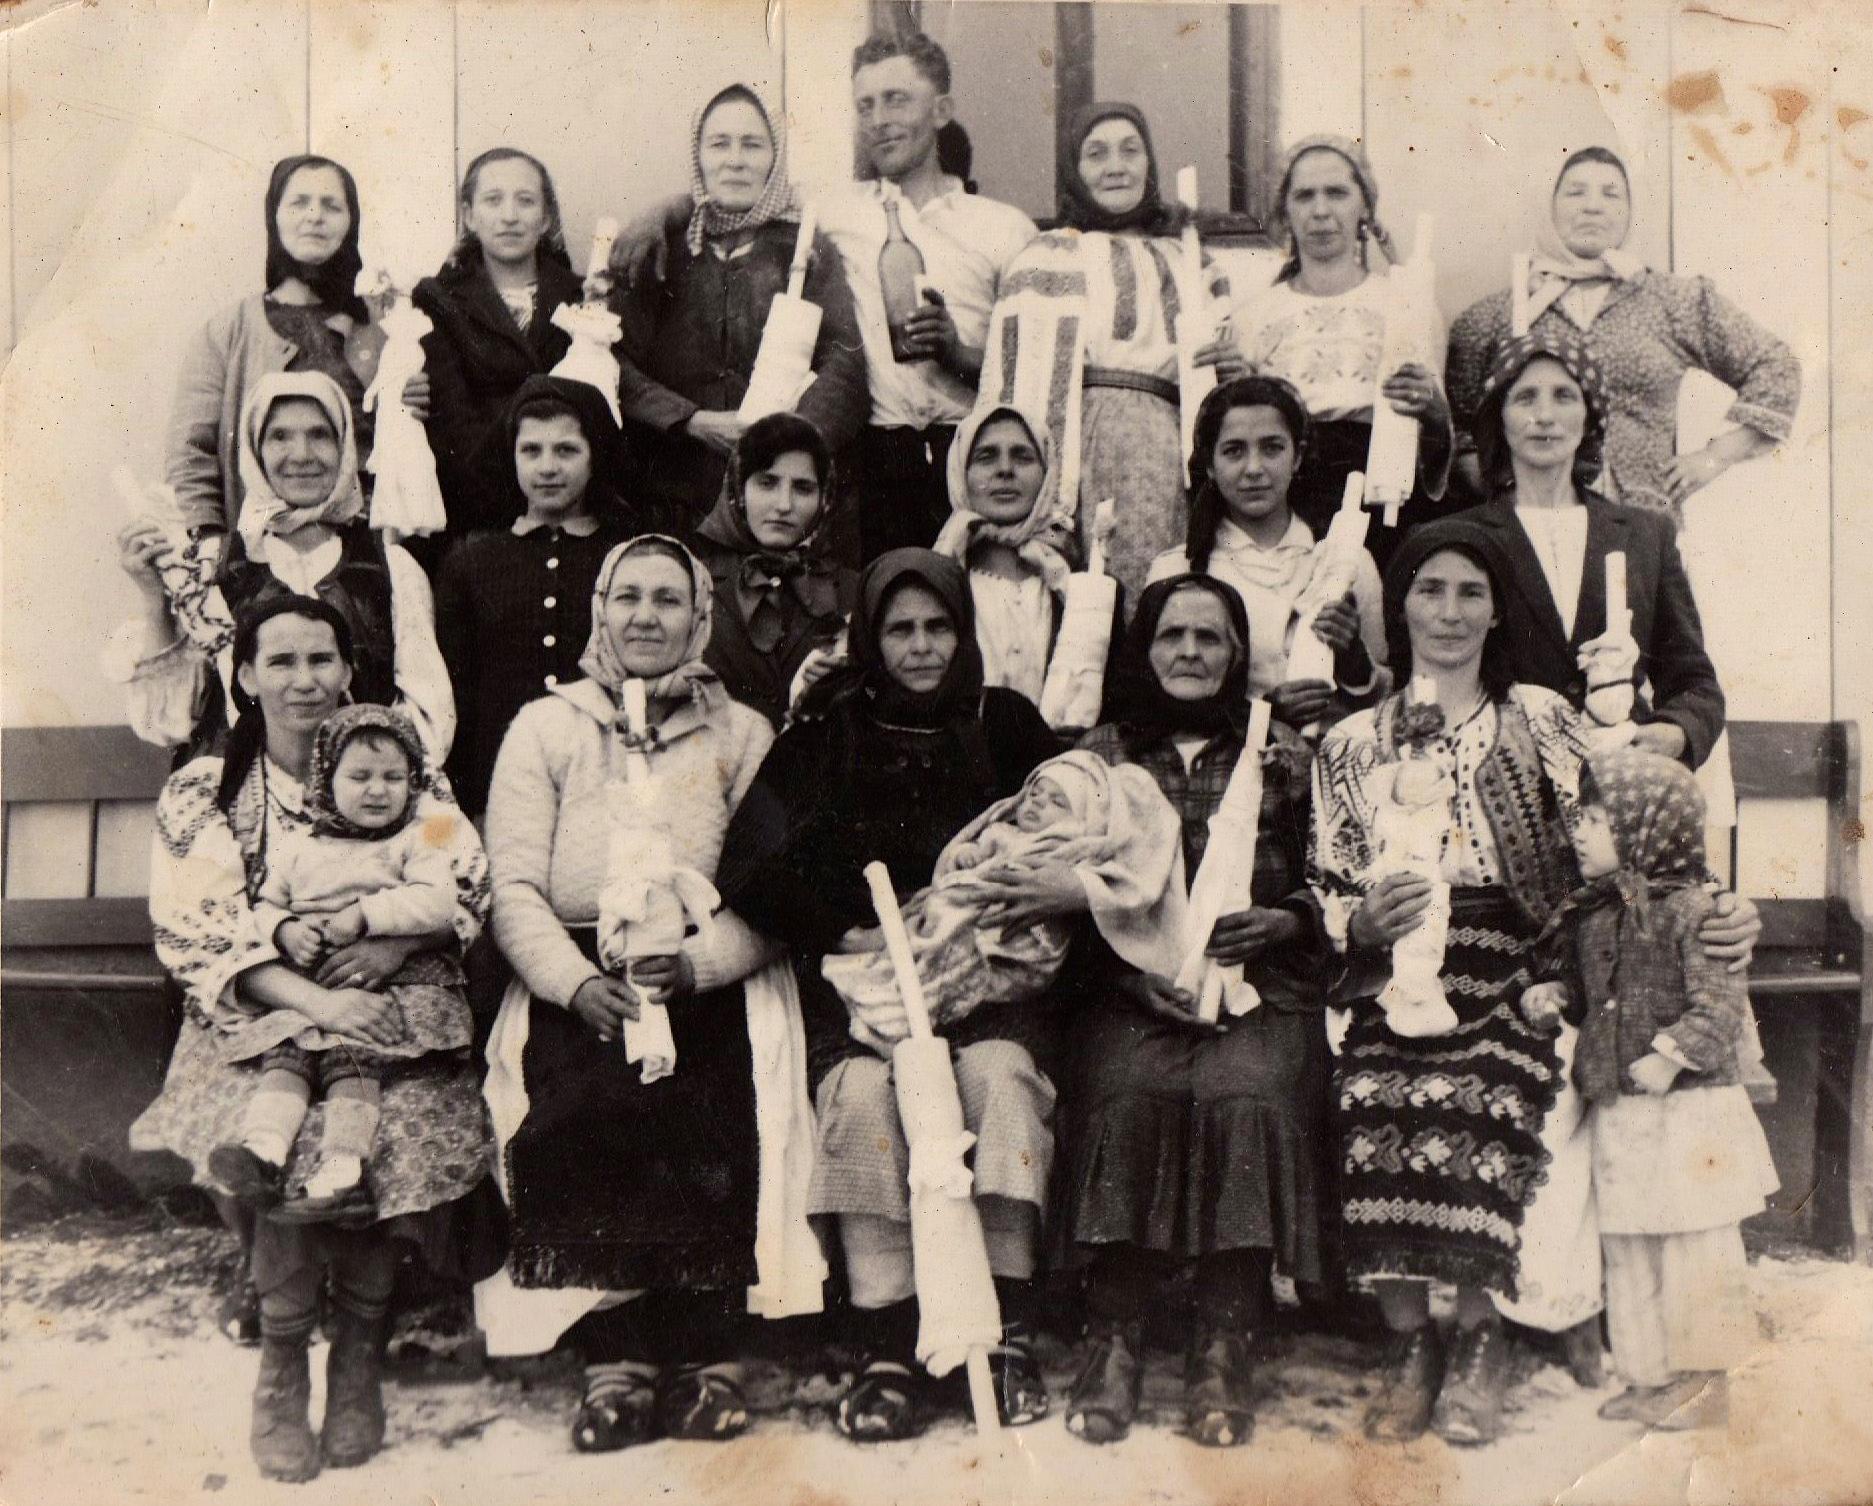 botez-in-familia-cimpoiec59f-ioan-c59fi-dochia